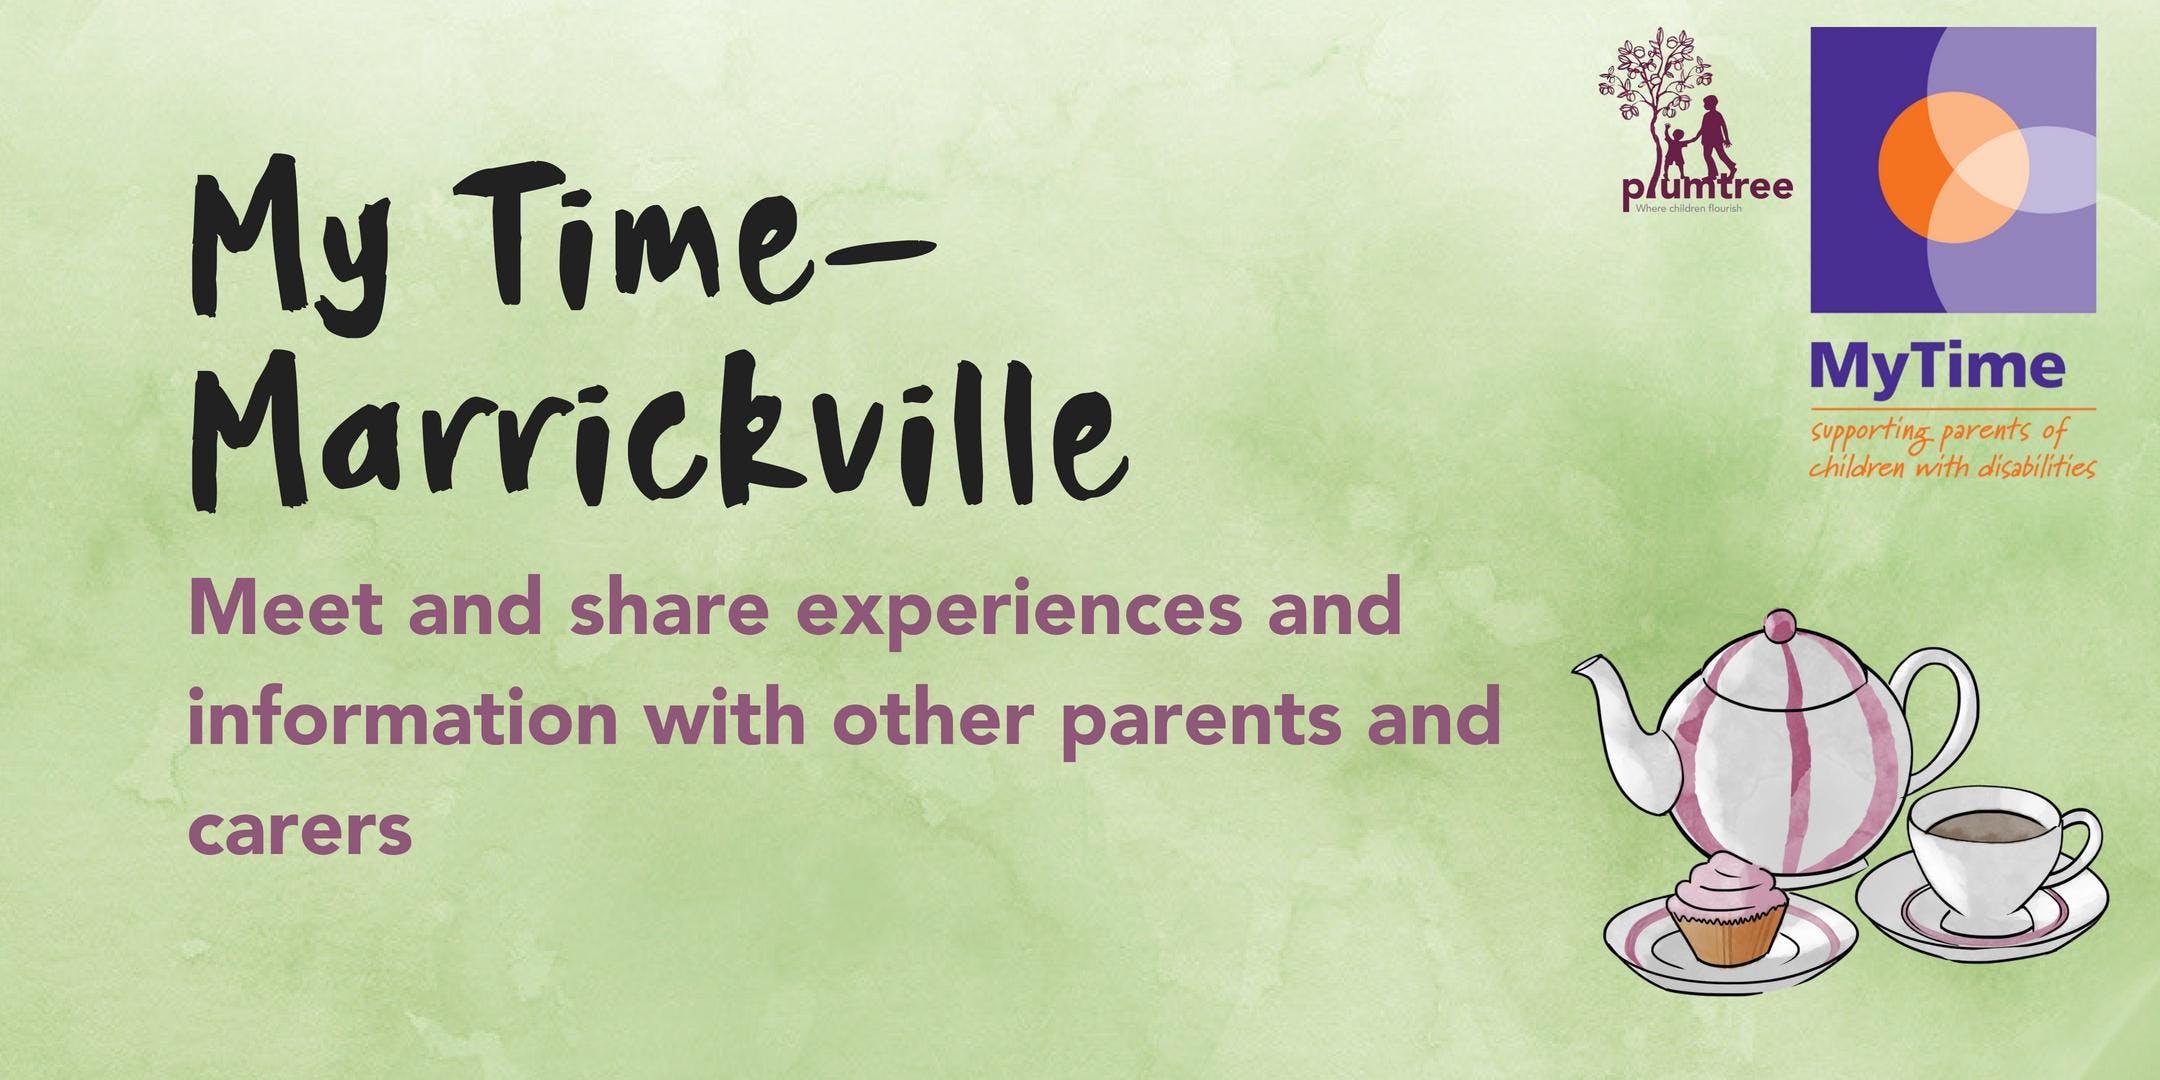 Marrickville- My Time Term 2